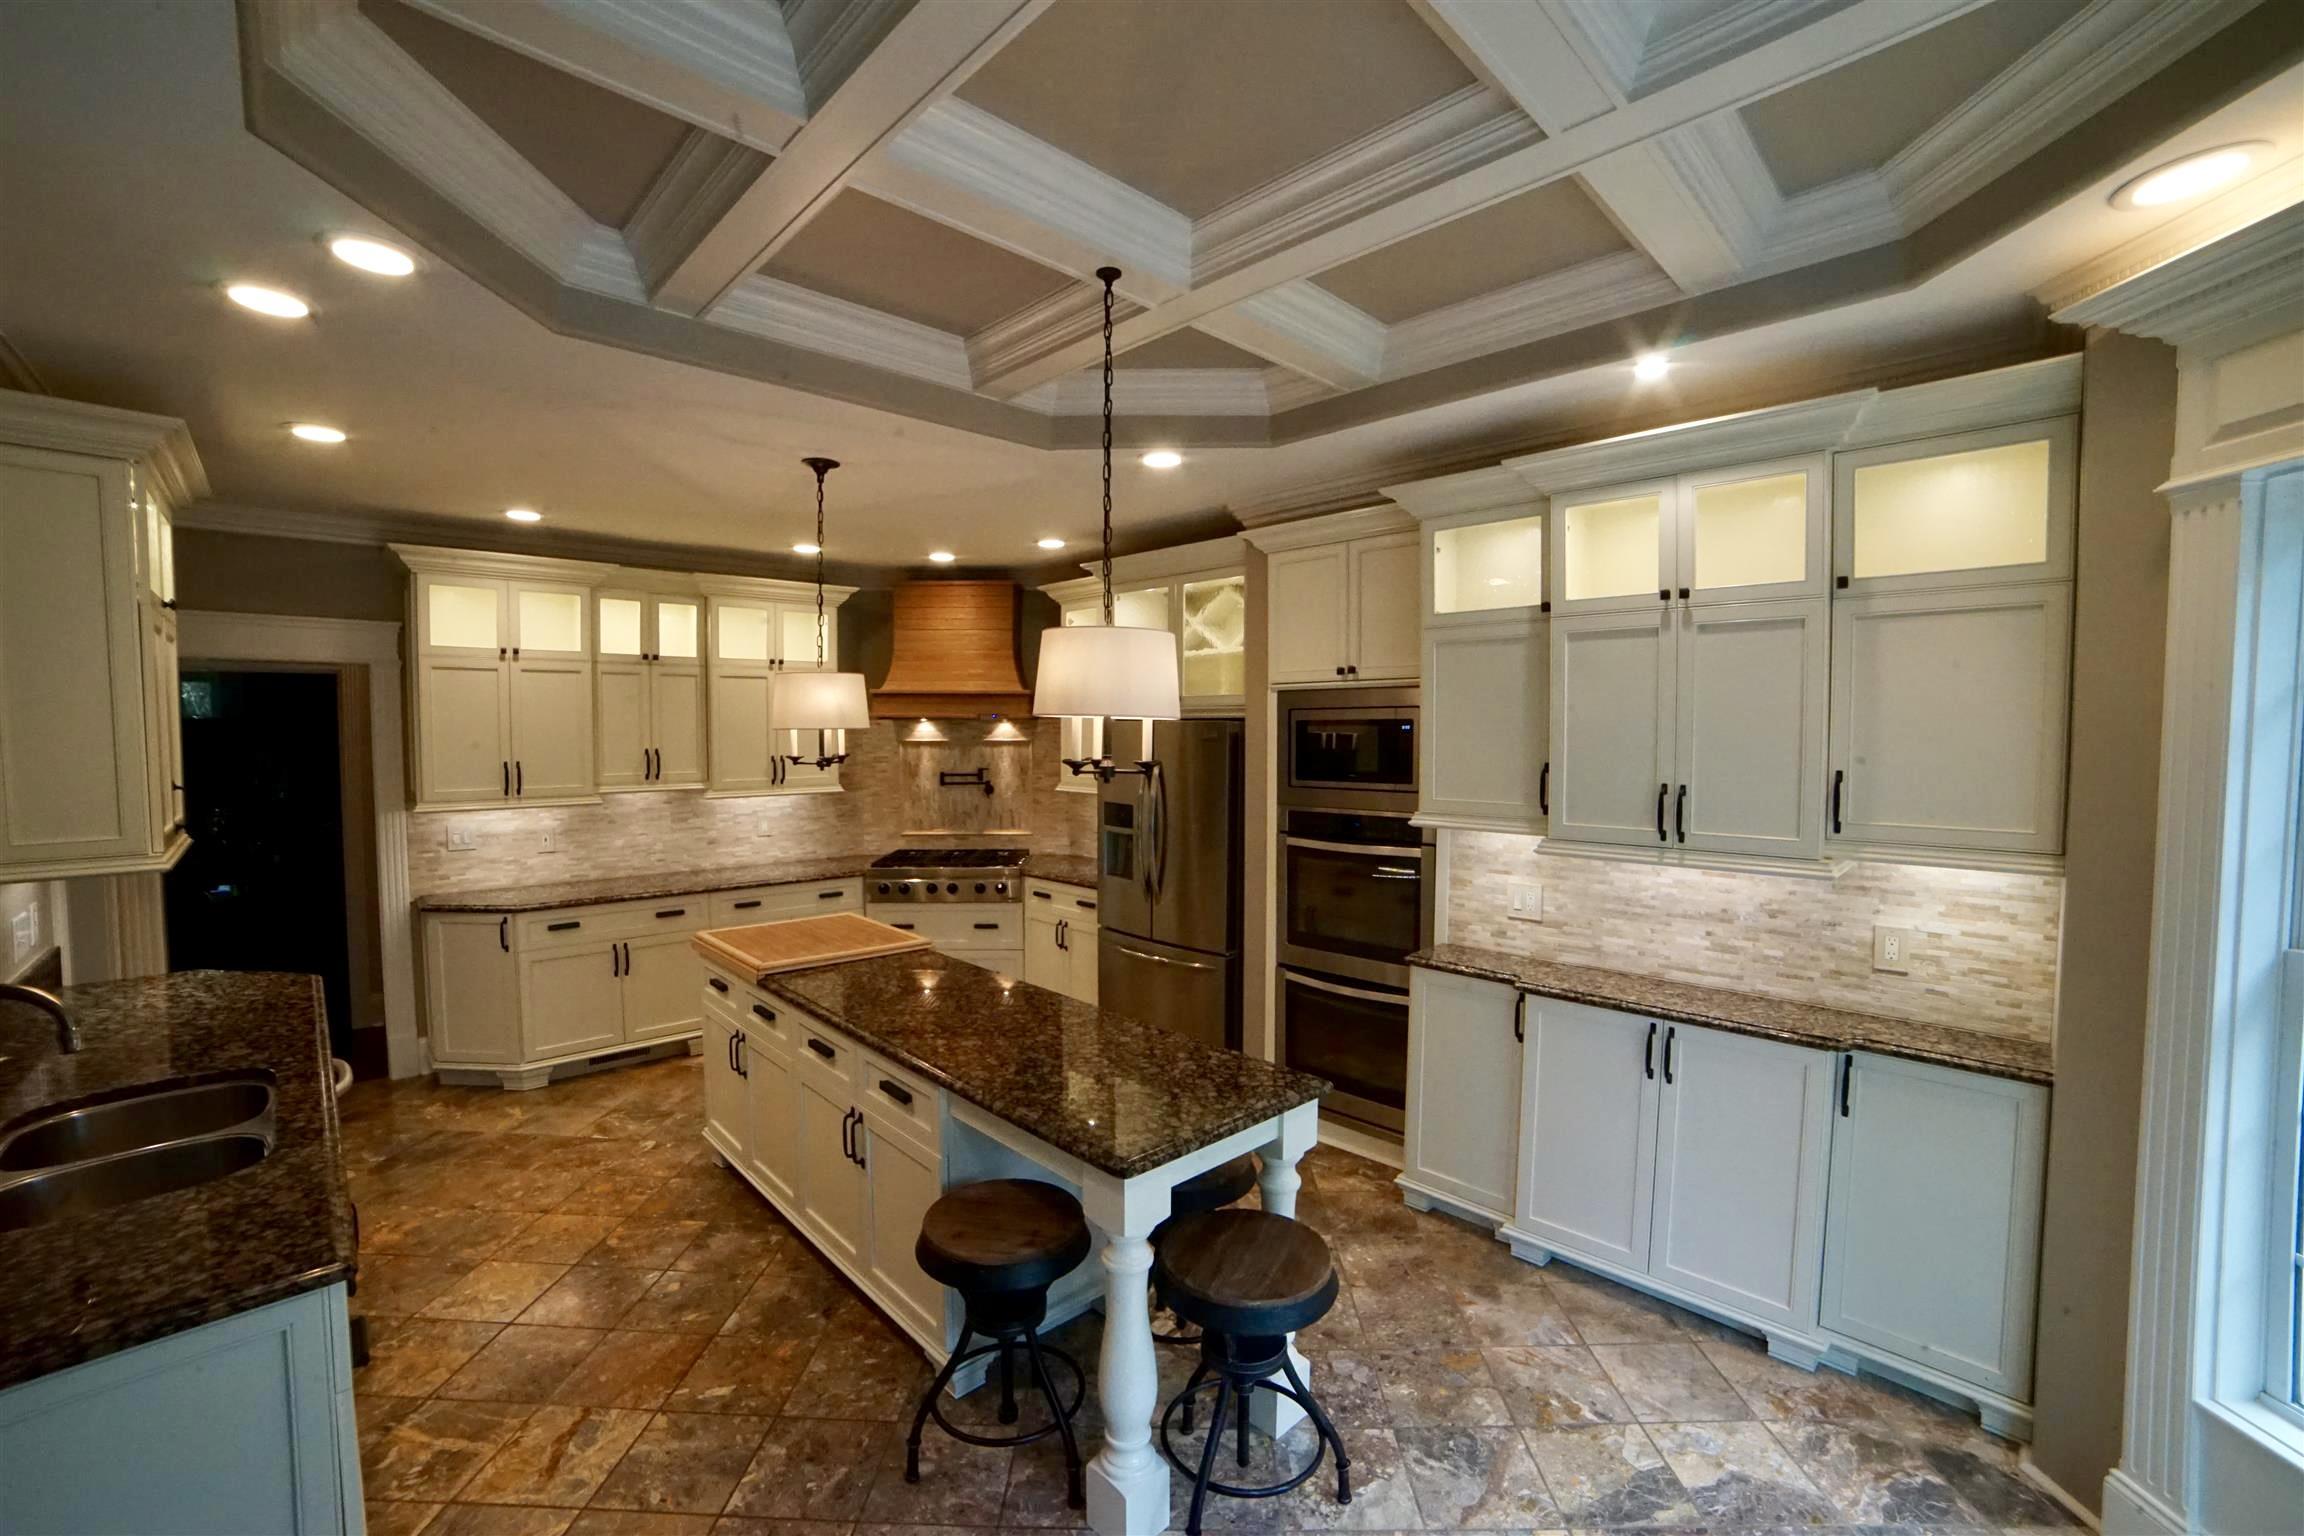 407 Annadel St, Murfreesboro, TN 37128 - Murfreesboro, TN real estate listing